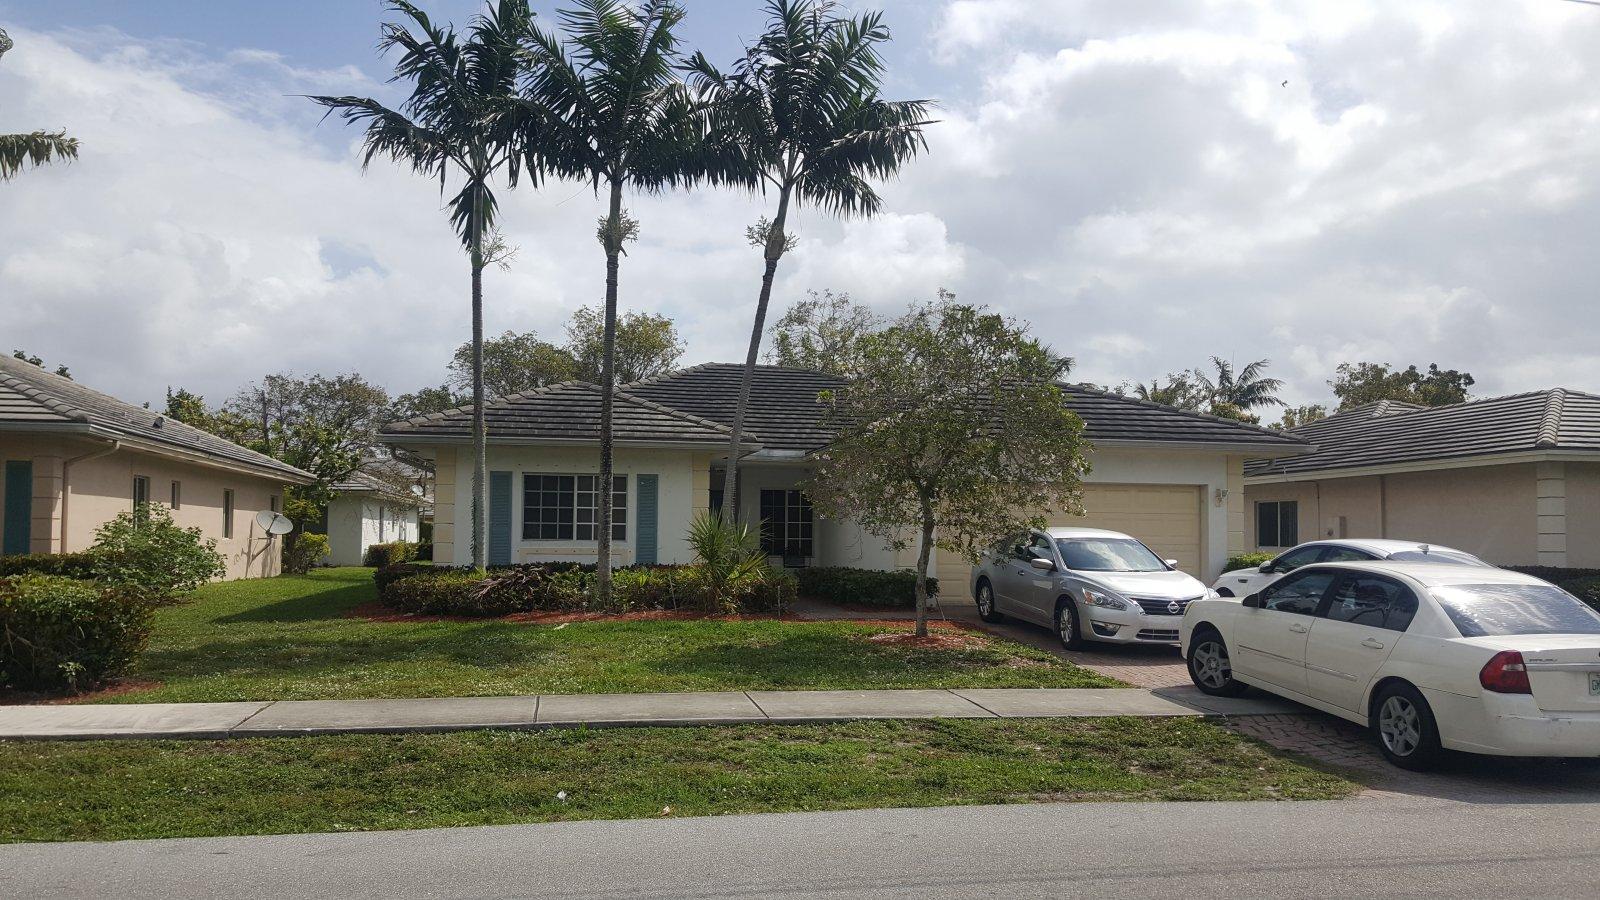 304 NW 18th Ave, Pompano Beach, Florida 33069